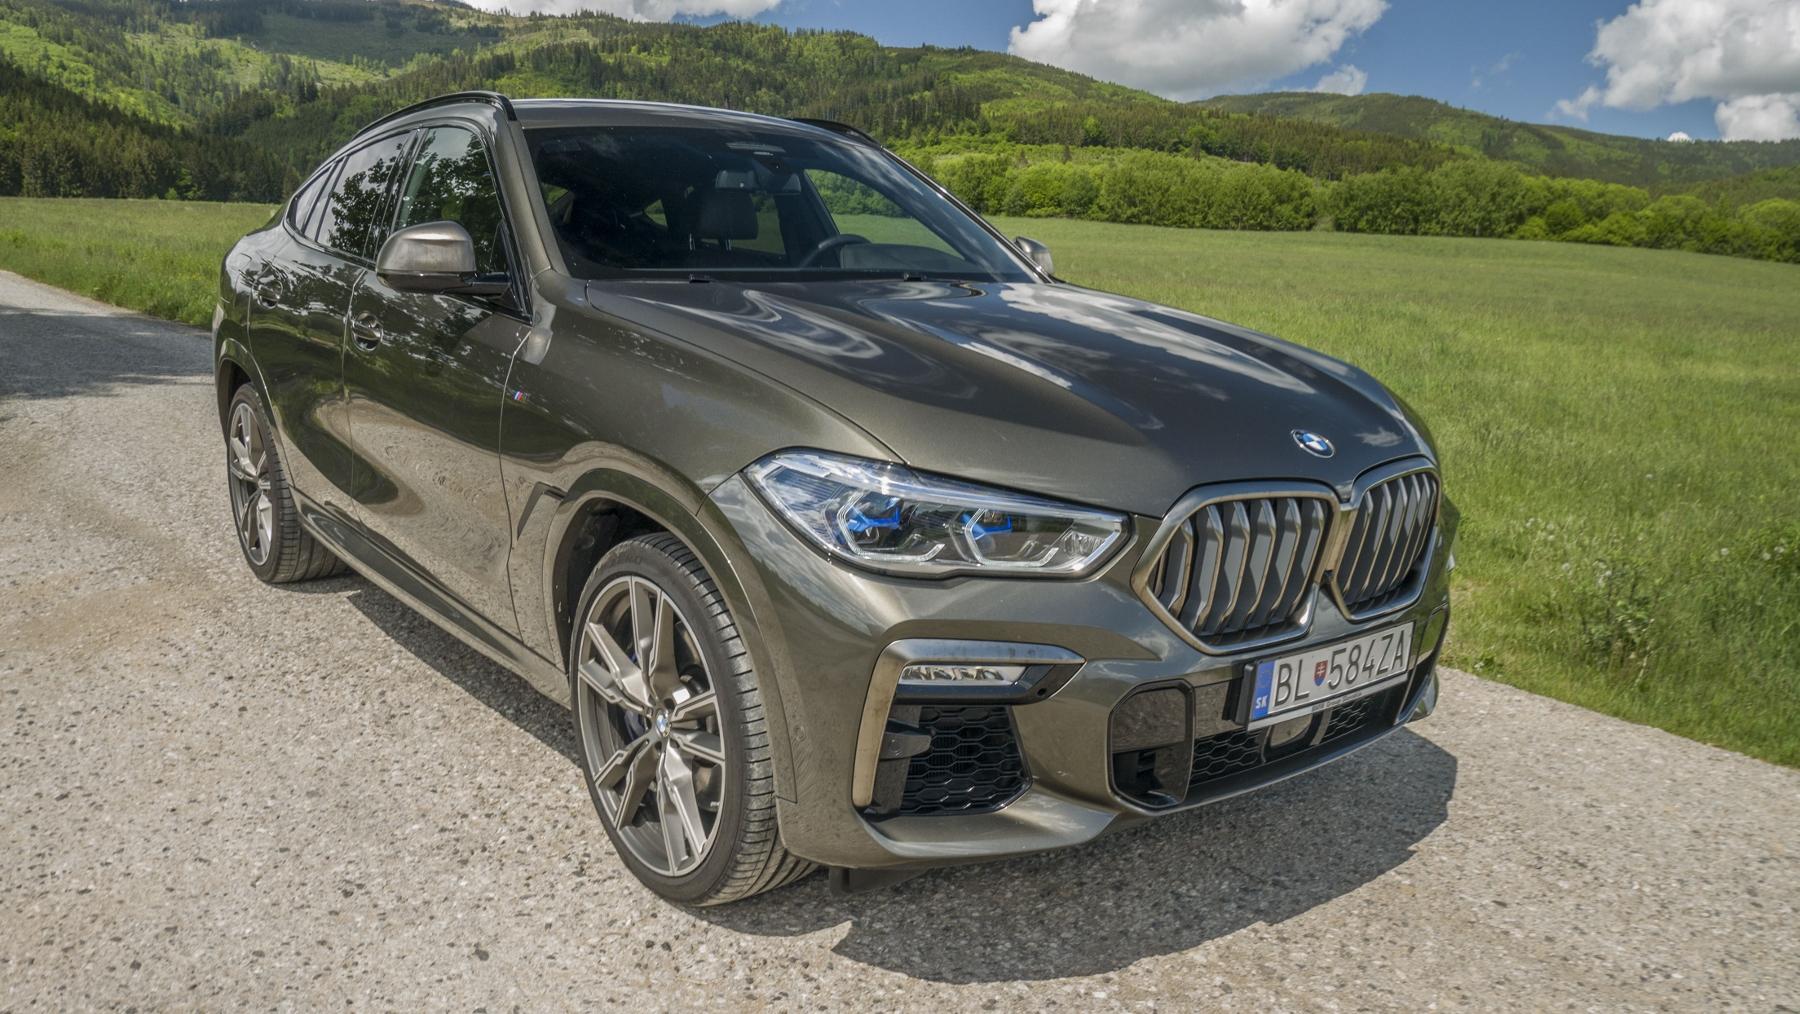 Test: BMW X6 M50i napína benzínové svaly, ale neukazuje plnú silu VQkK6Q7Oez bmw-x6-m50i-6